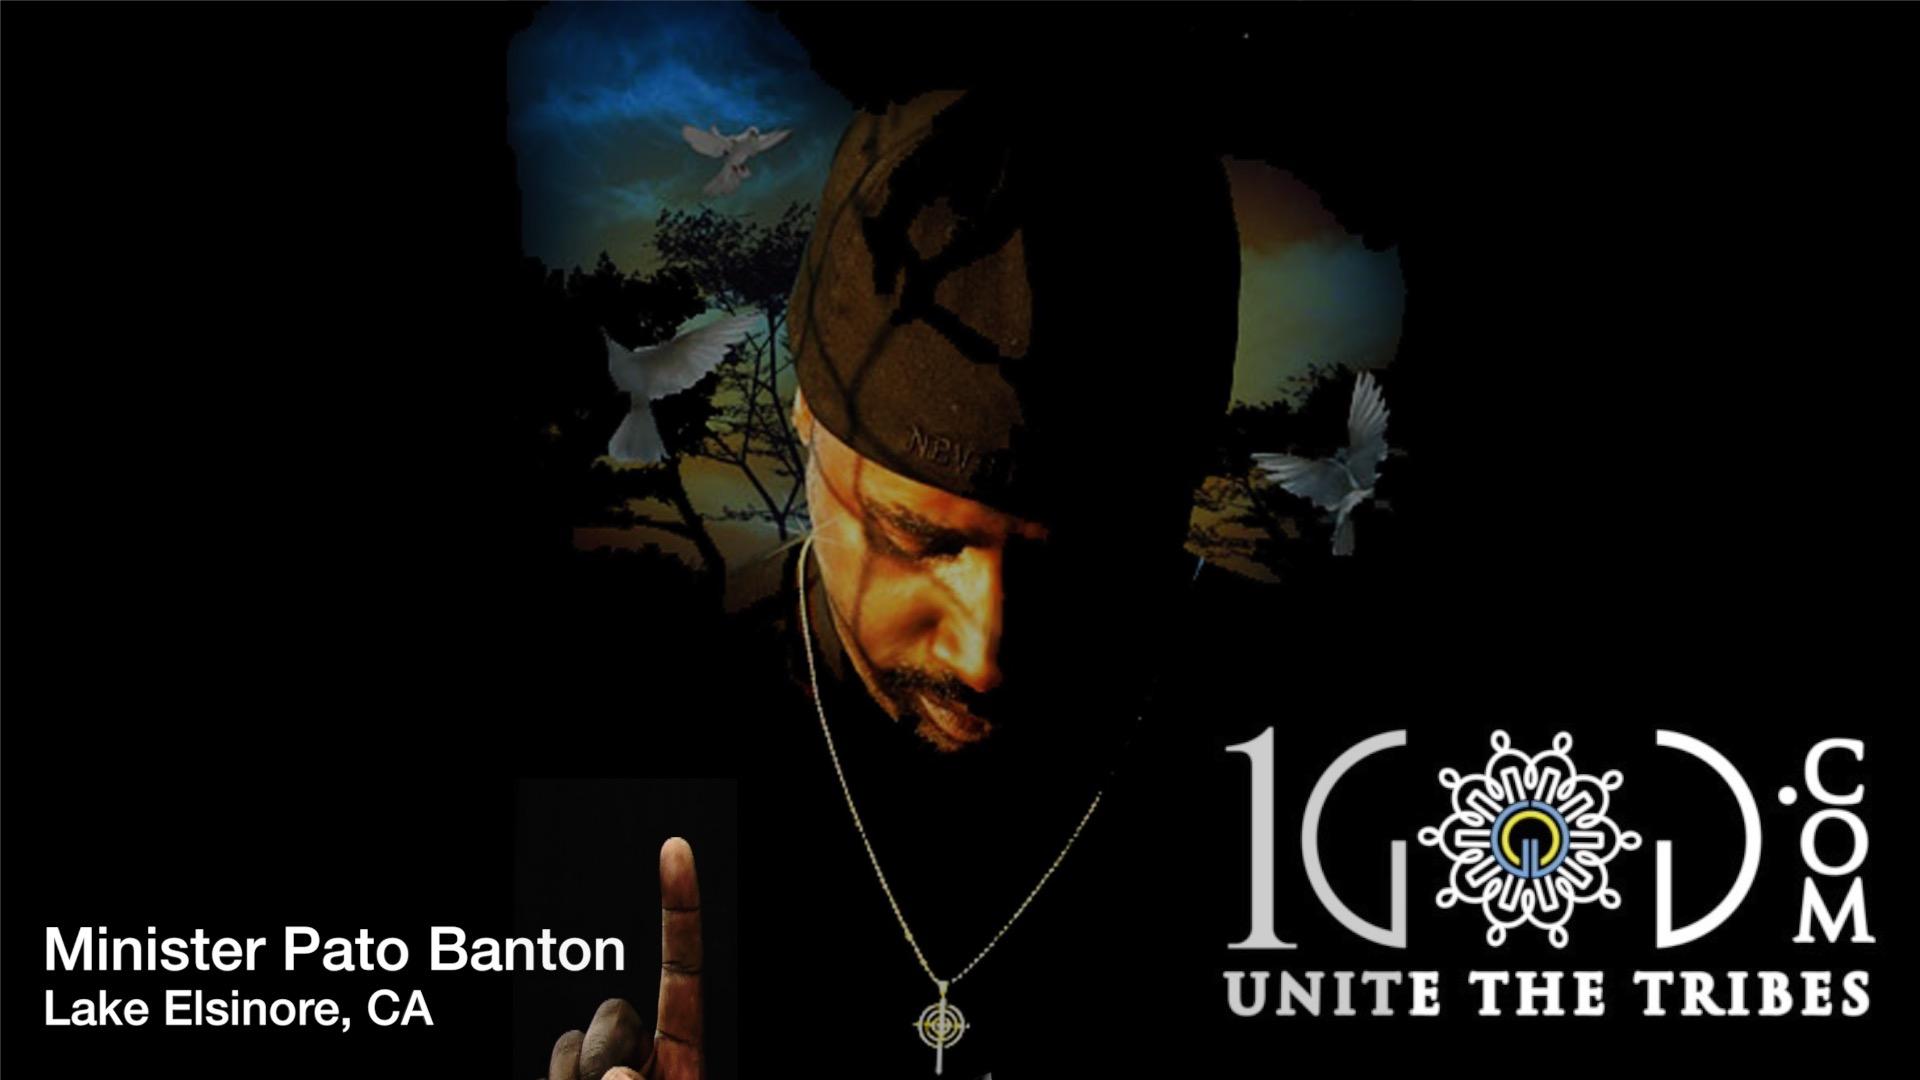 *Pato Banton 1God.com